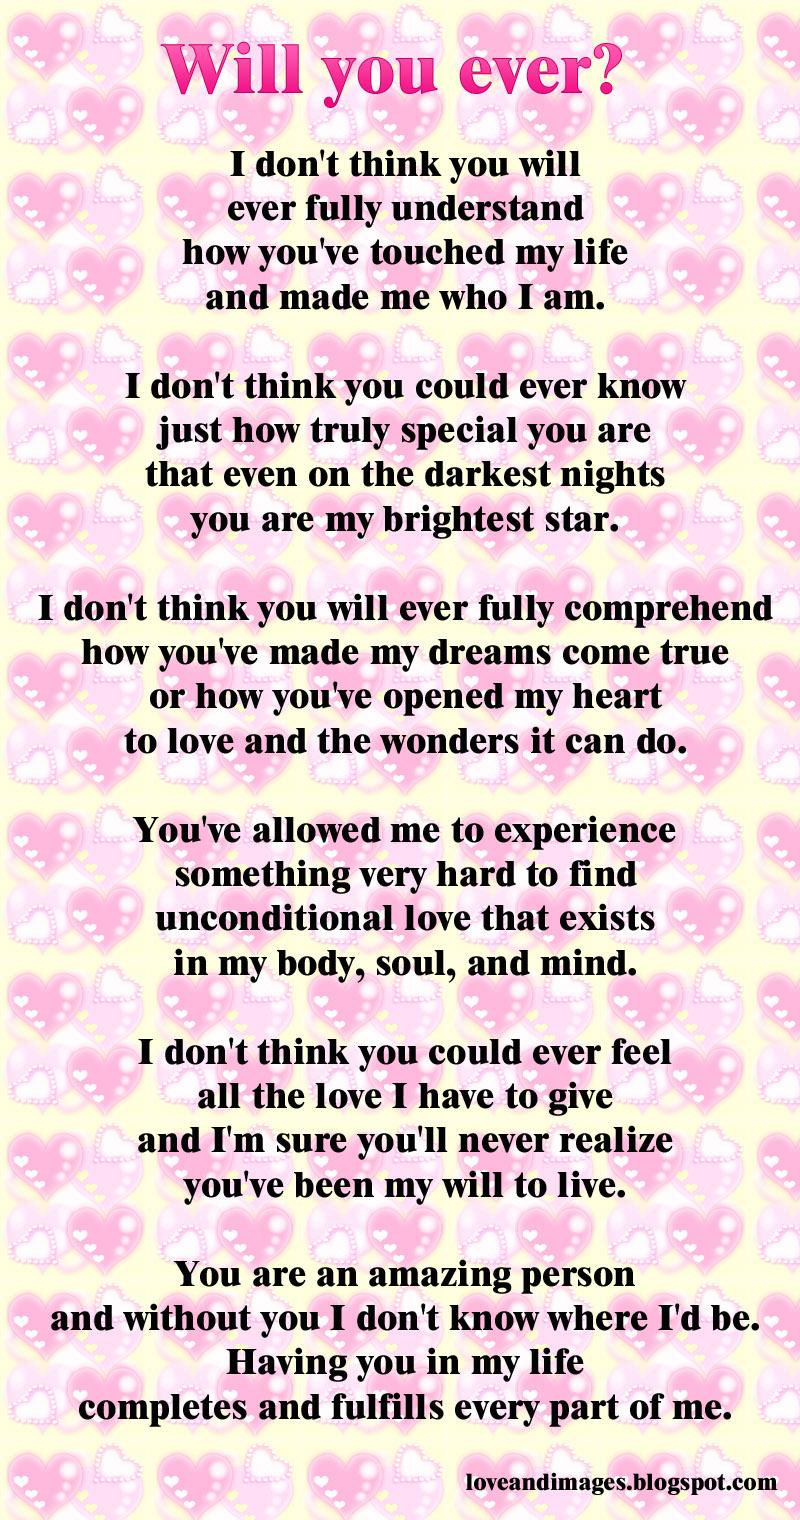 bello poema amor ingles